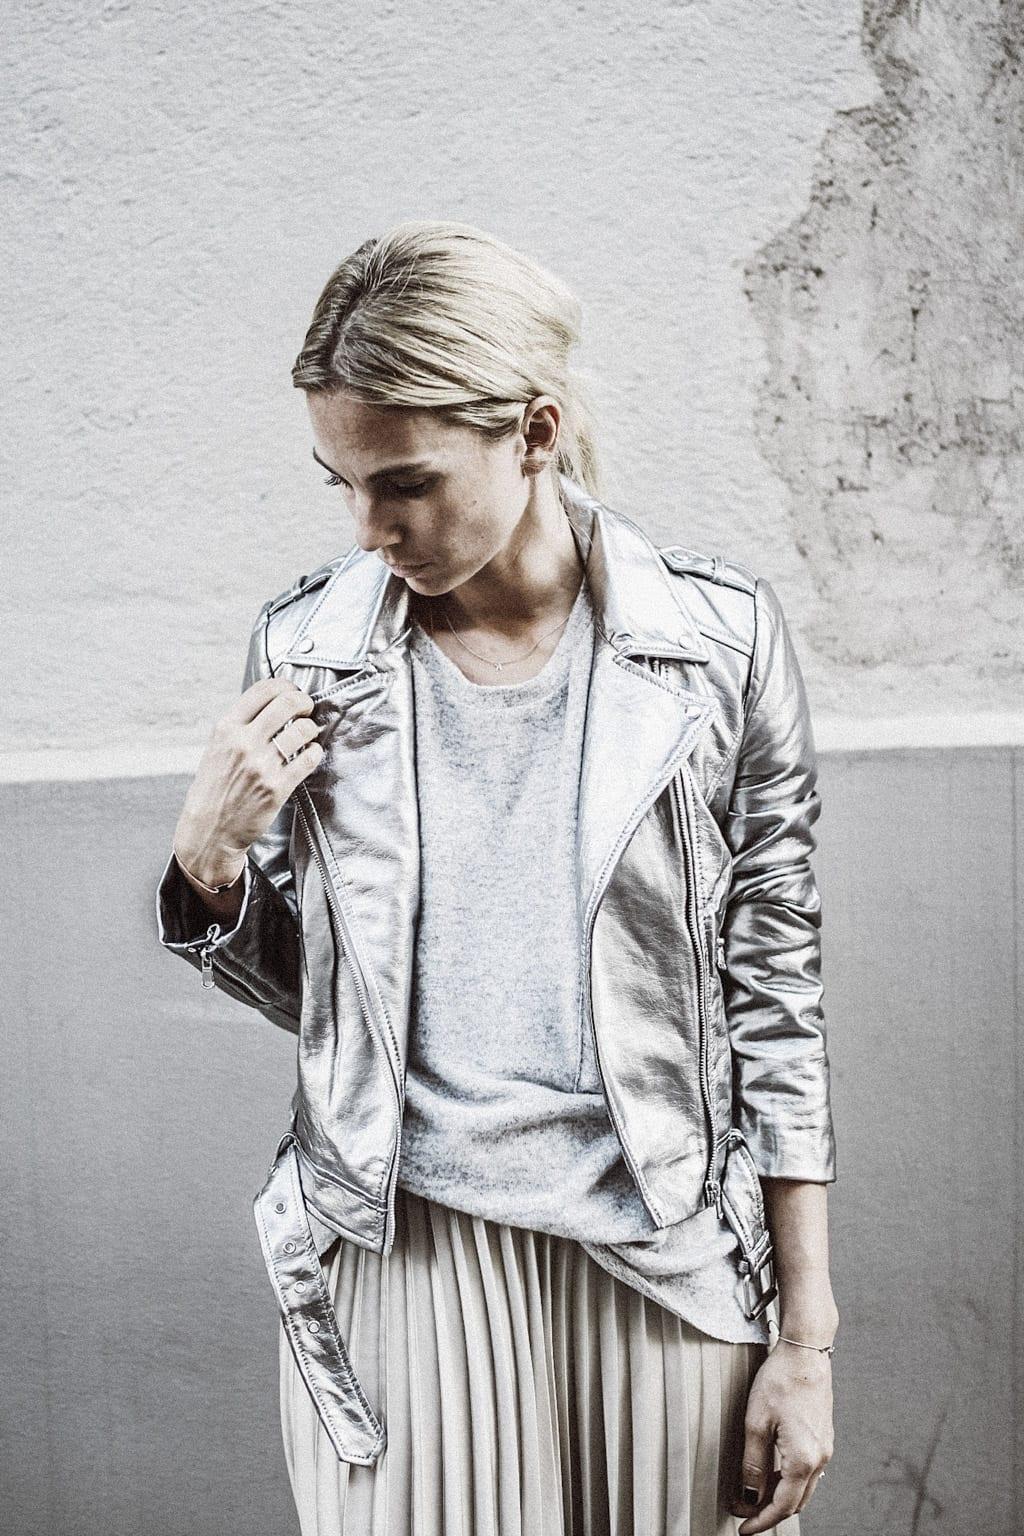 ck-constantlyk-com-karin-kaswurm-street-style-fashion-silver-leather-jacket-plissee-6957